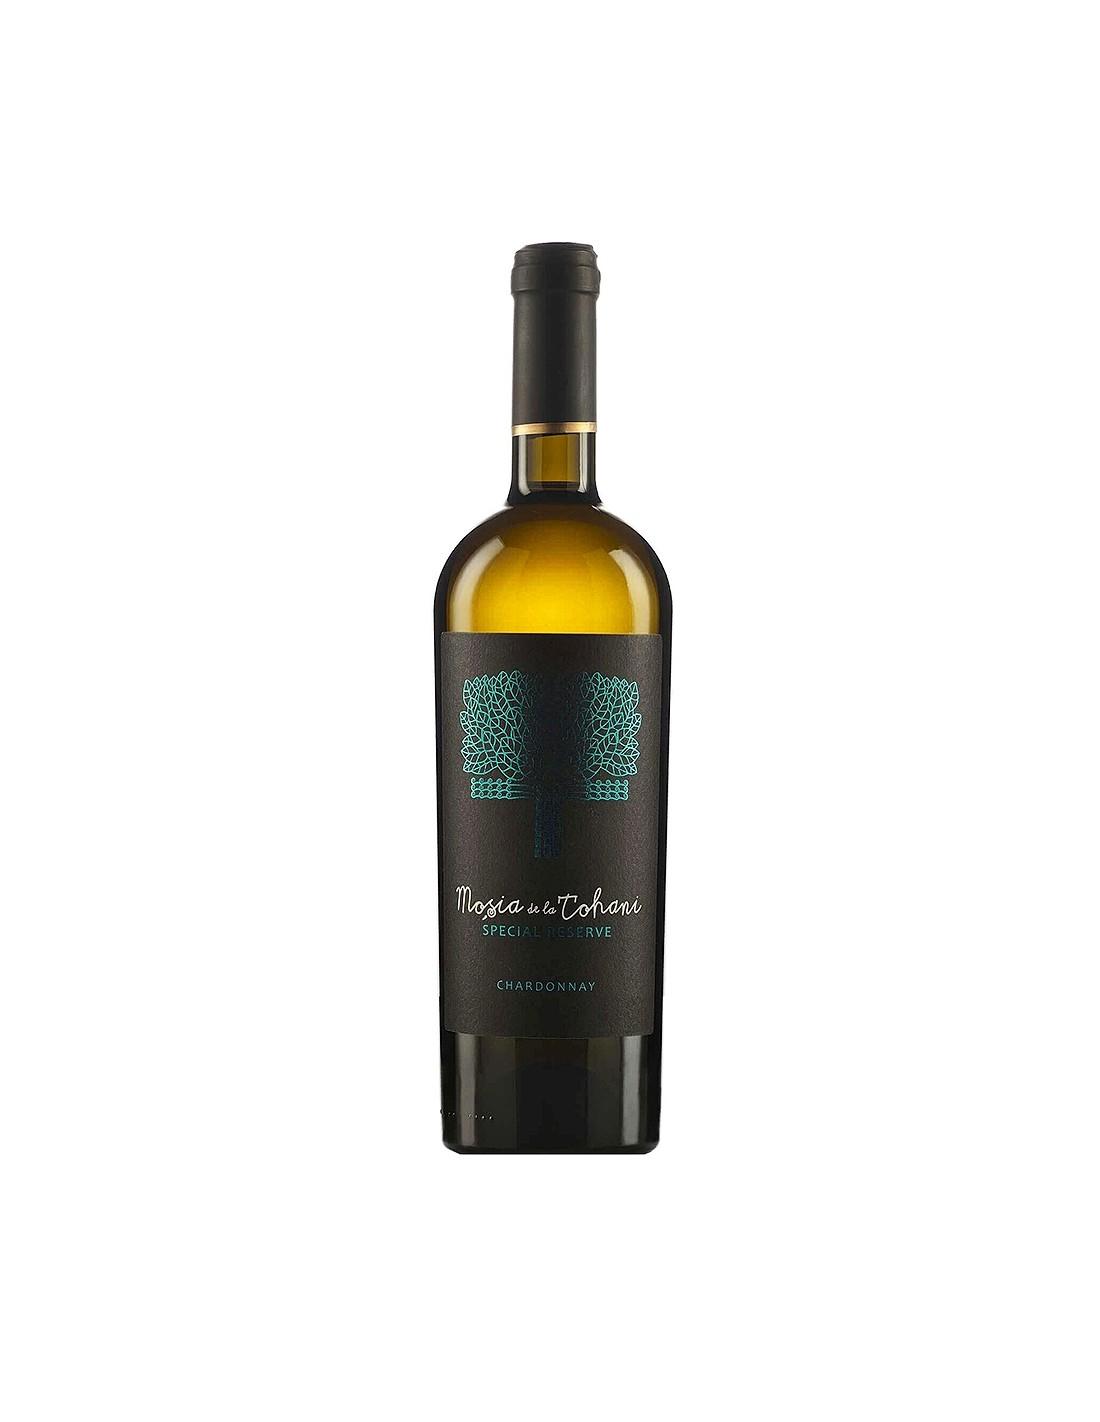 Vin alb sec, Chardonnay, Mosia Tohani Special Reserve, 13.5% alc, 0.75L, Romania